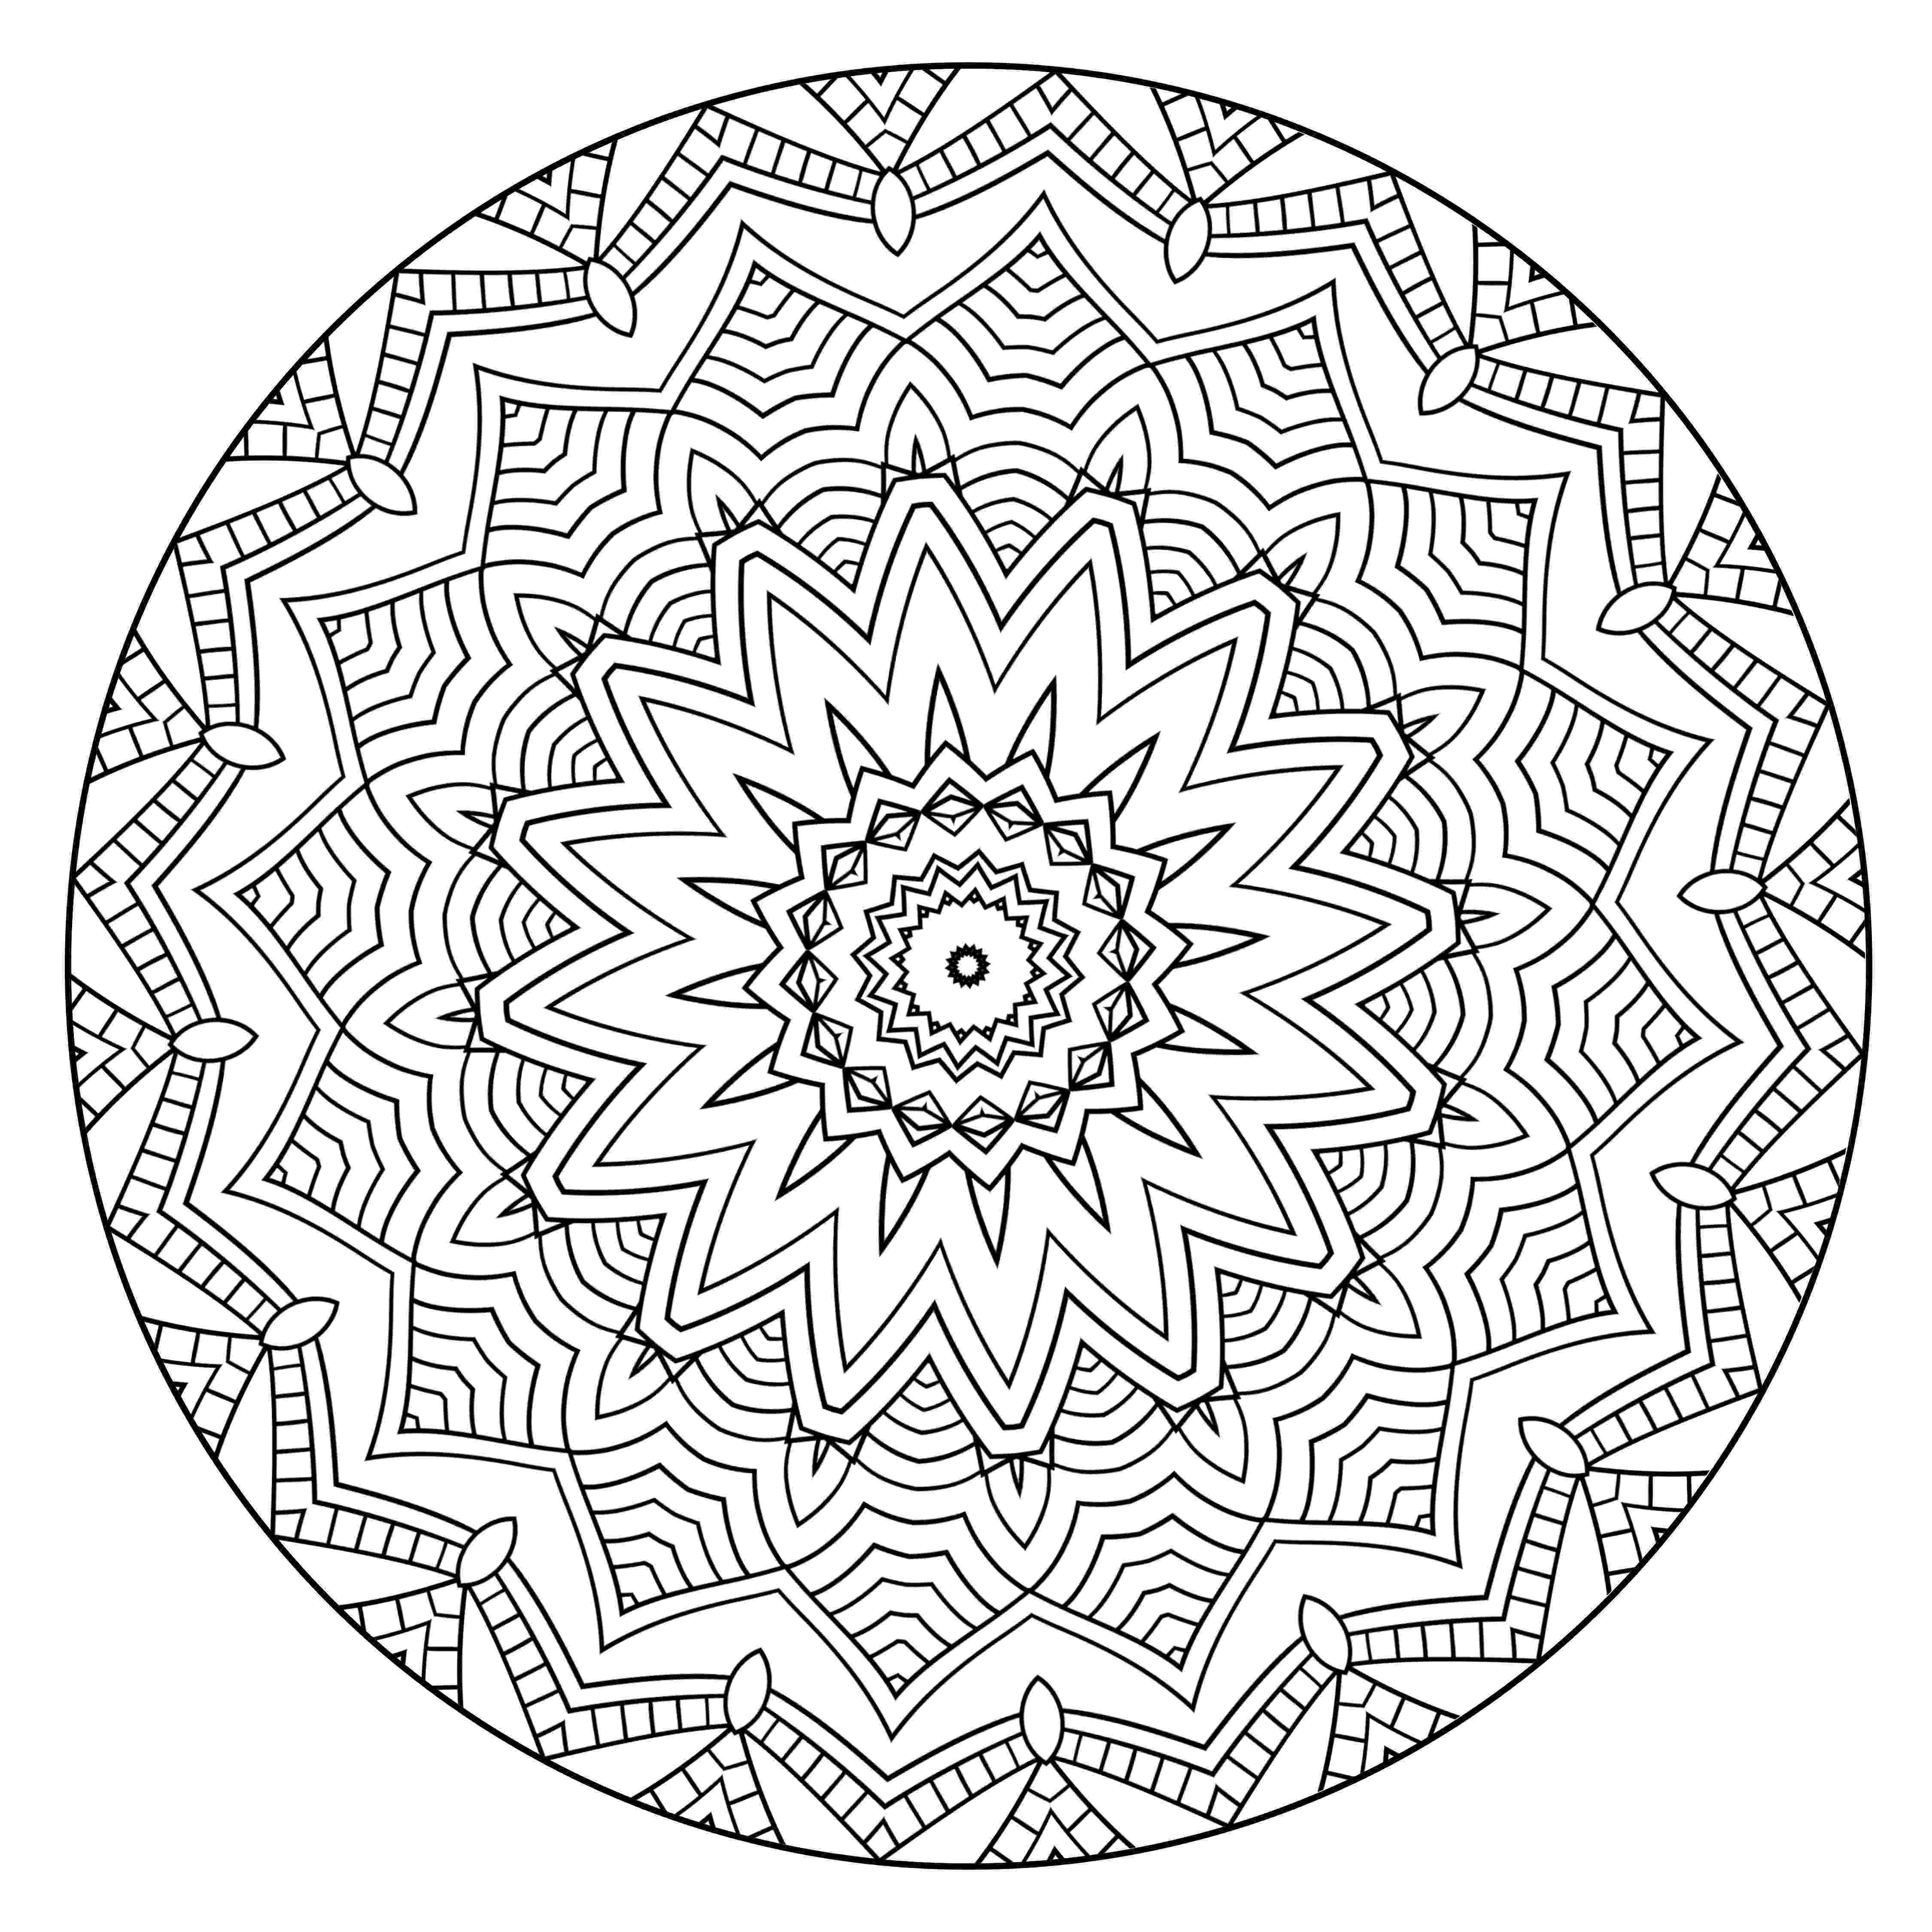 mandalas mandala coloring pages for kids to download and print for free mandalas